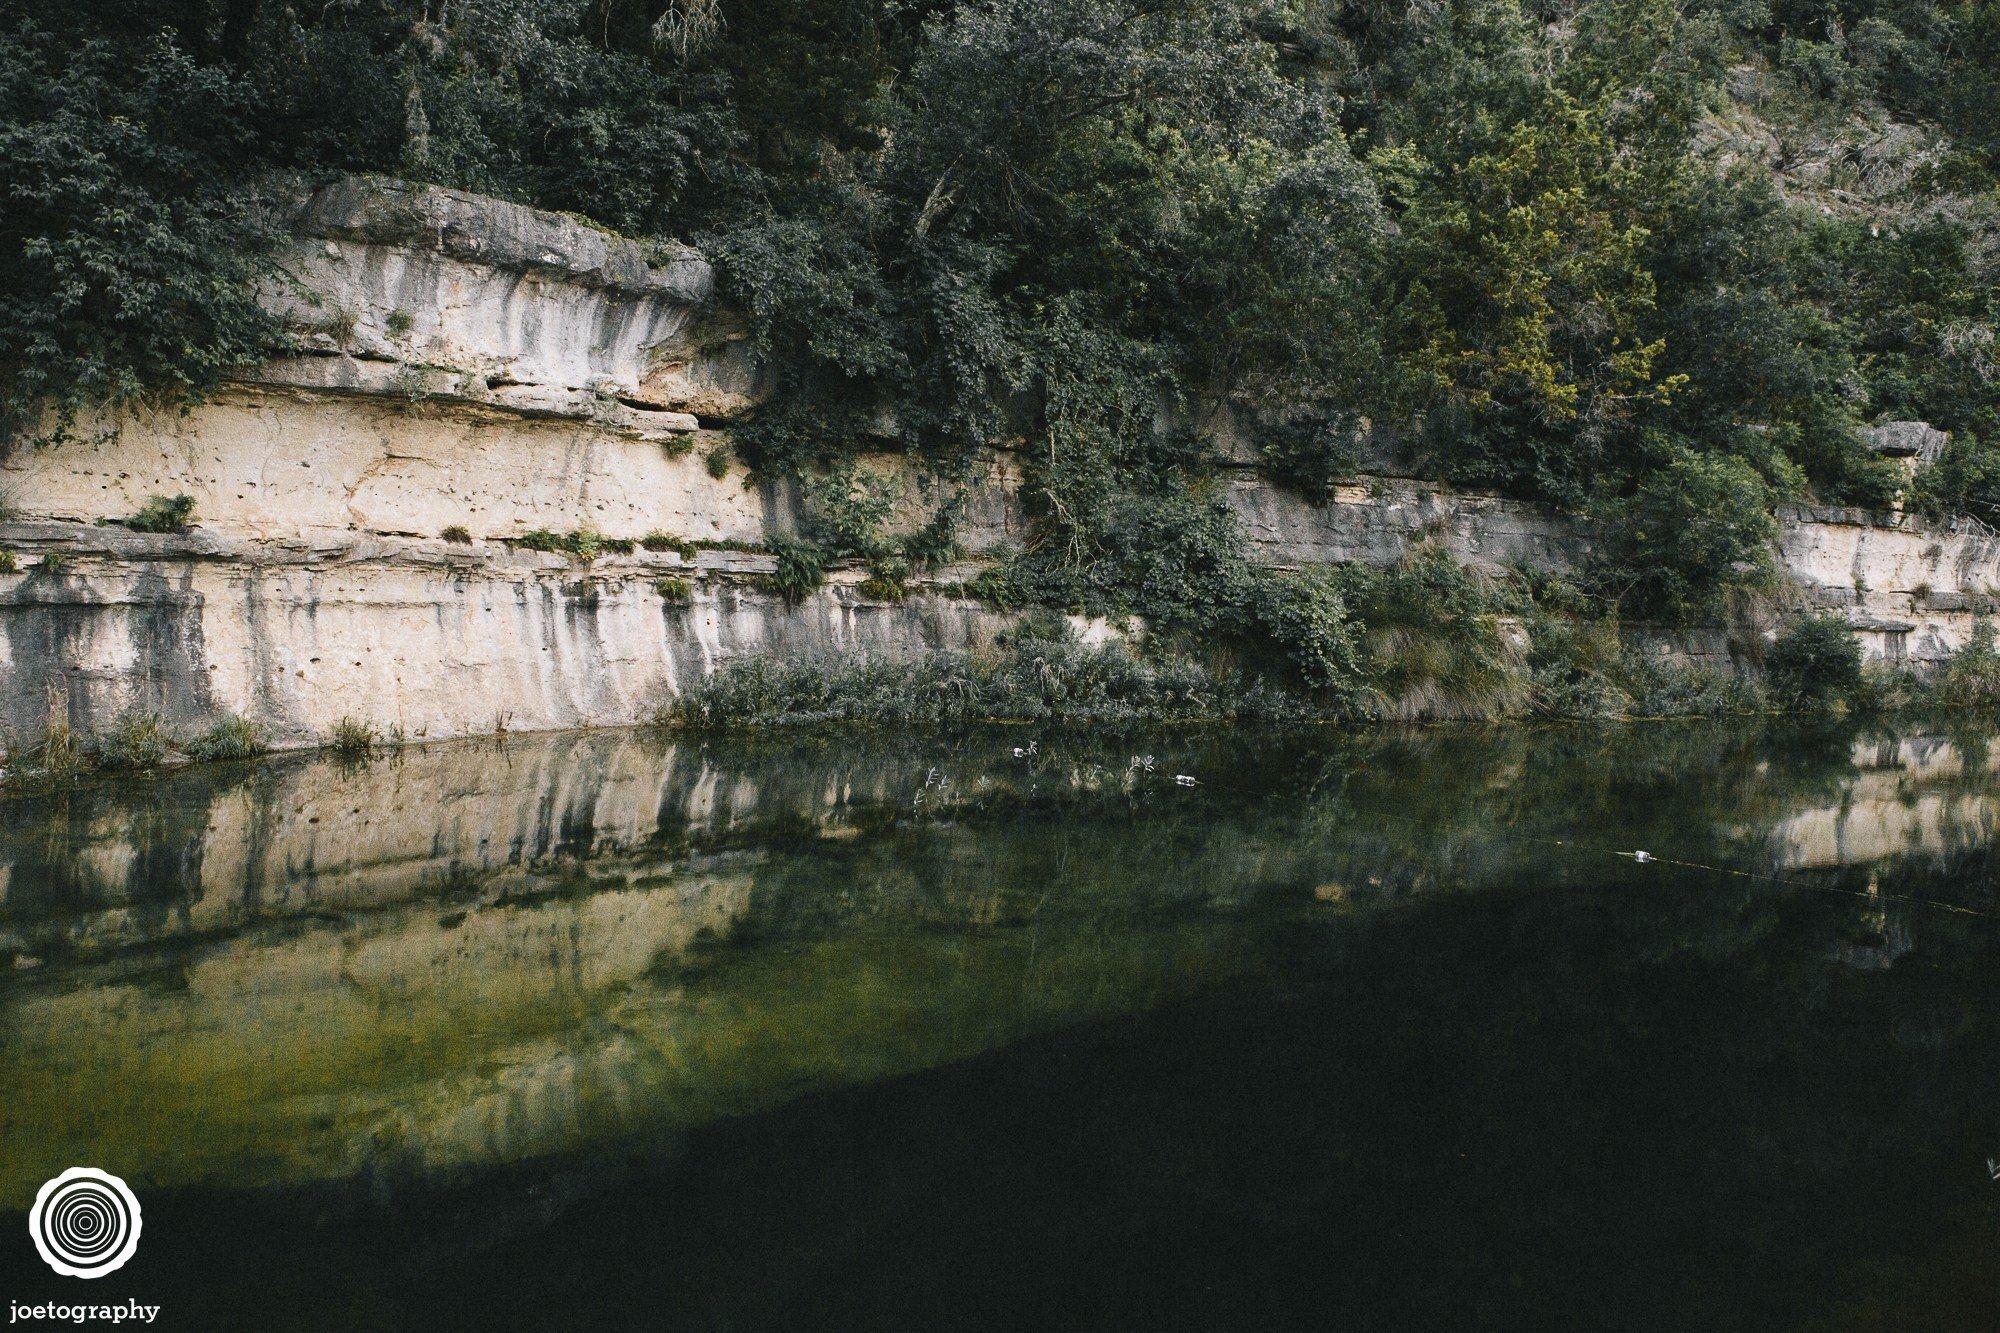 laity-lodge-san-antonio-texas-landscape-photographer-indianapolis-2